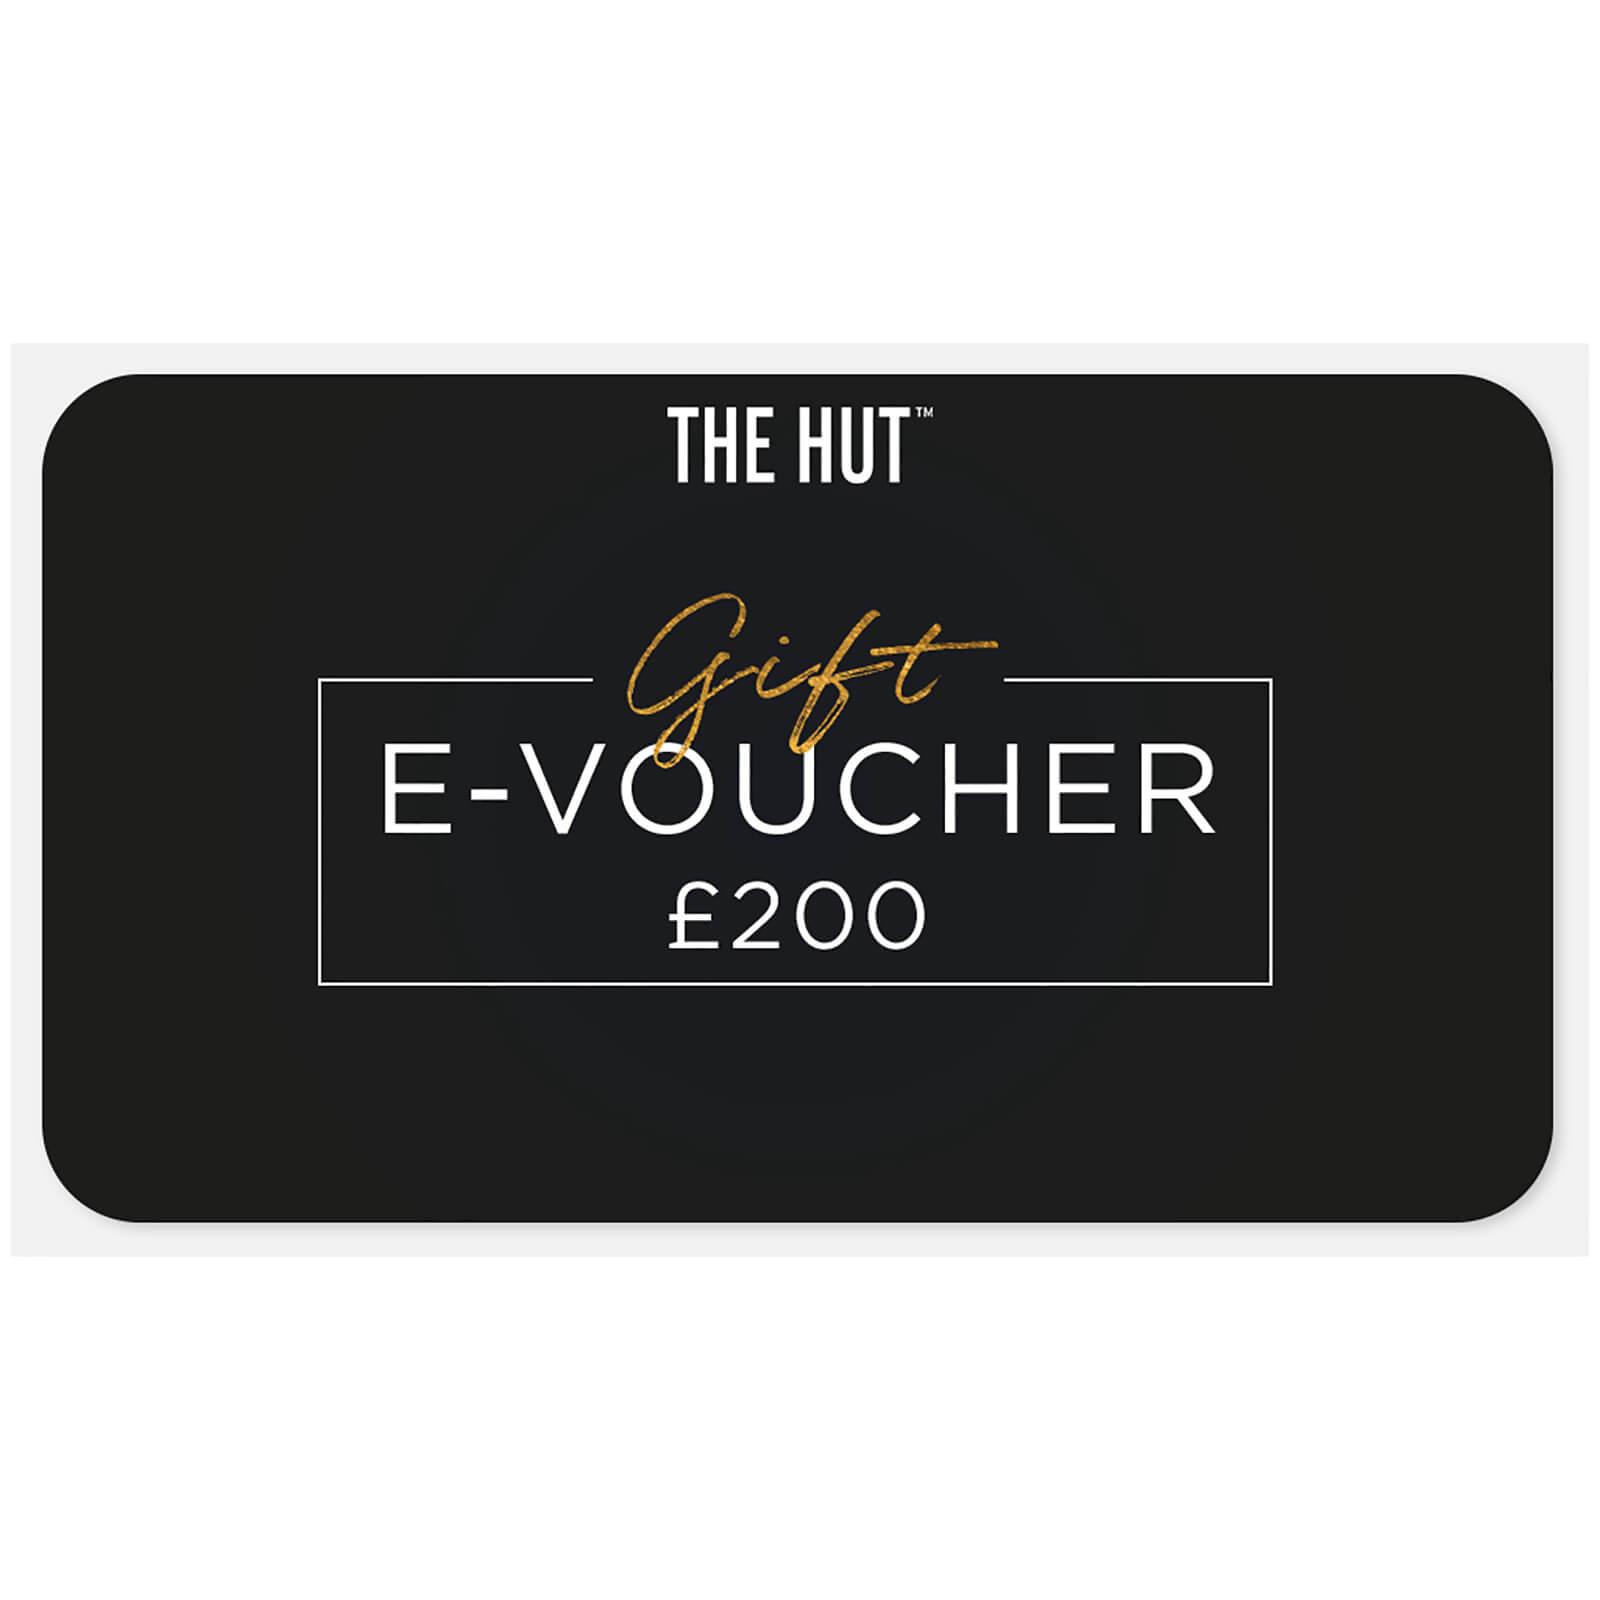 The Hut £200 The Hut Gift Voucher